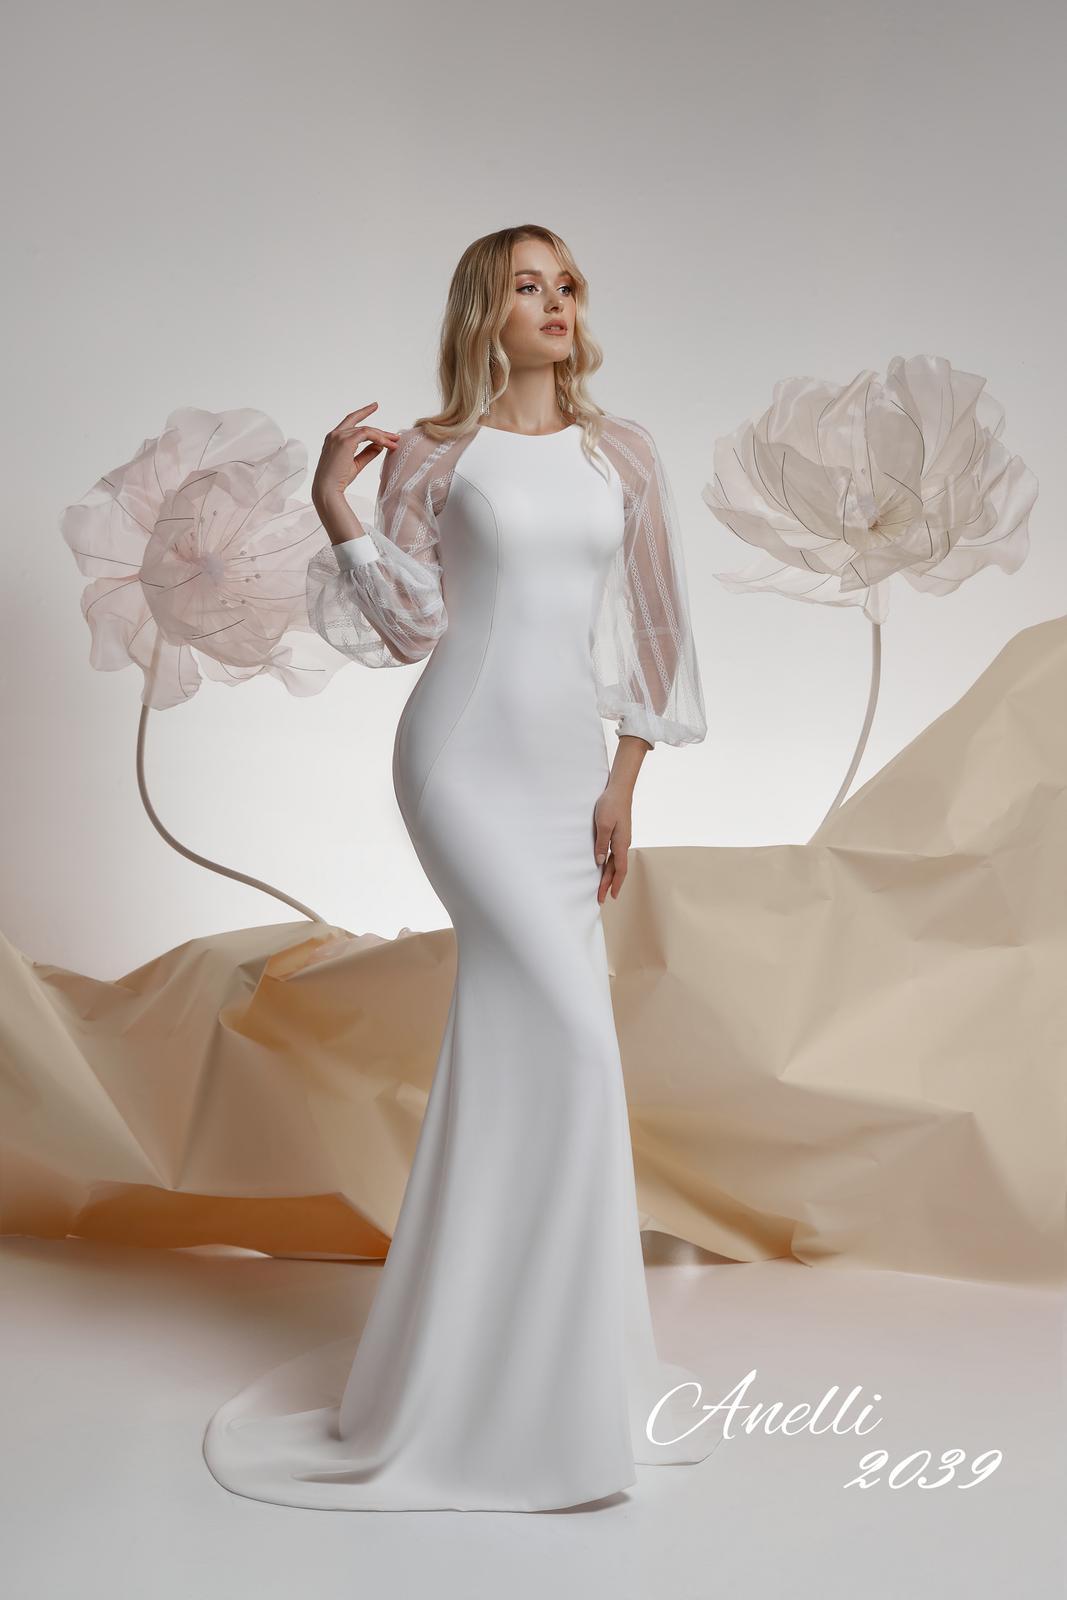 Svadobné šaty - Imagine 2039 - Obrázok č. 1